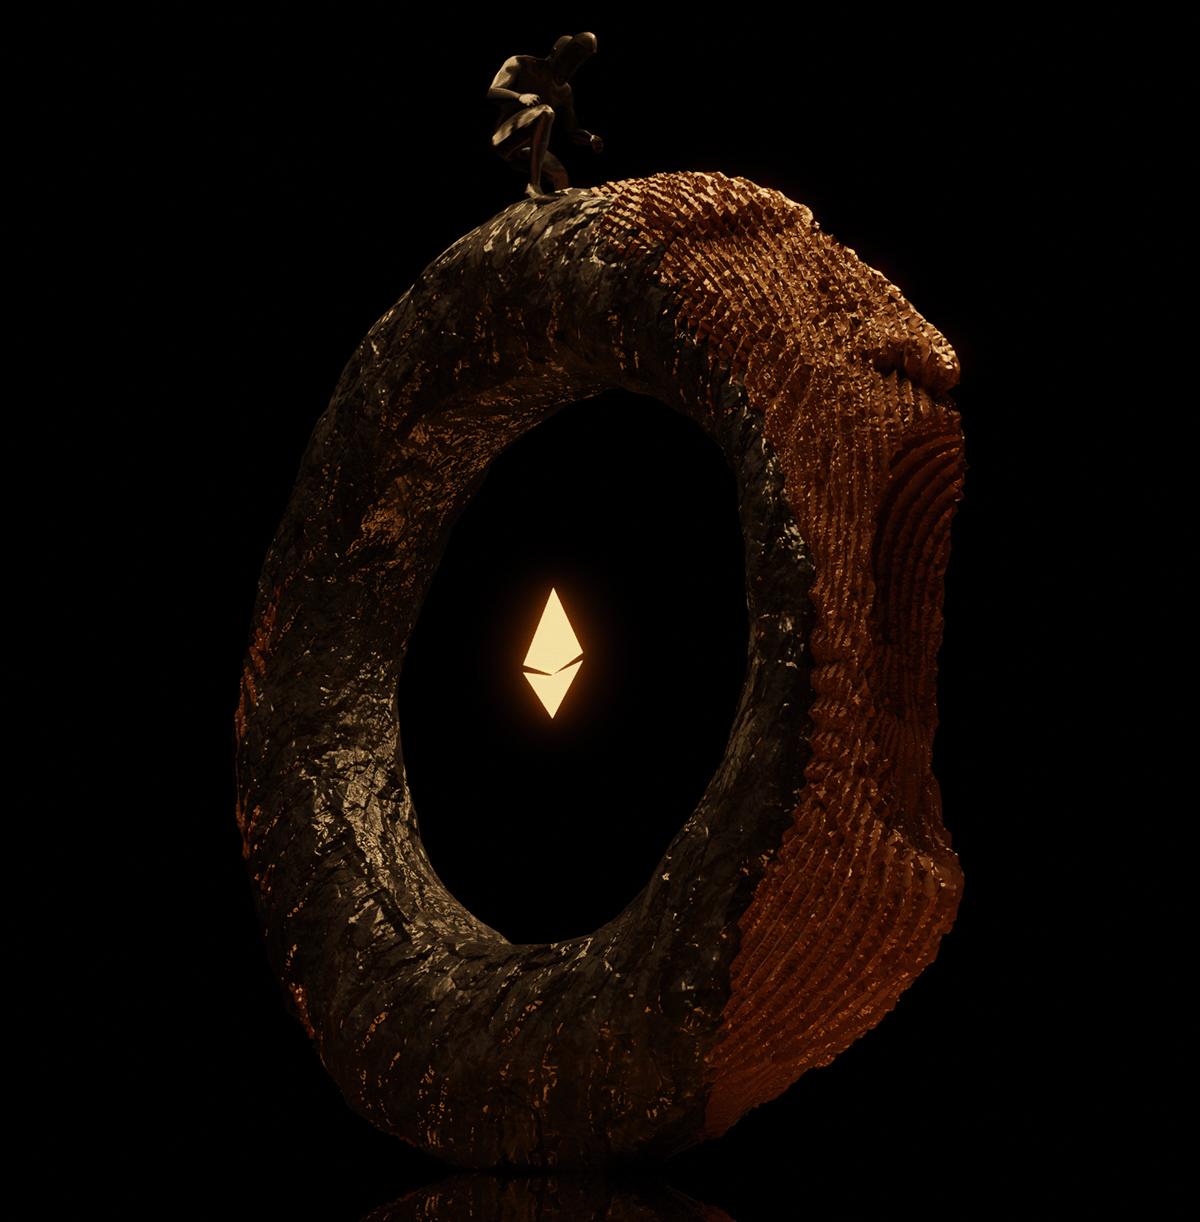 african crypto faces loop nft Paul Louise-Julie surreal tribal